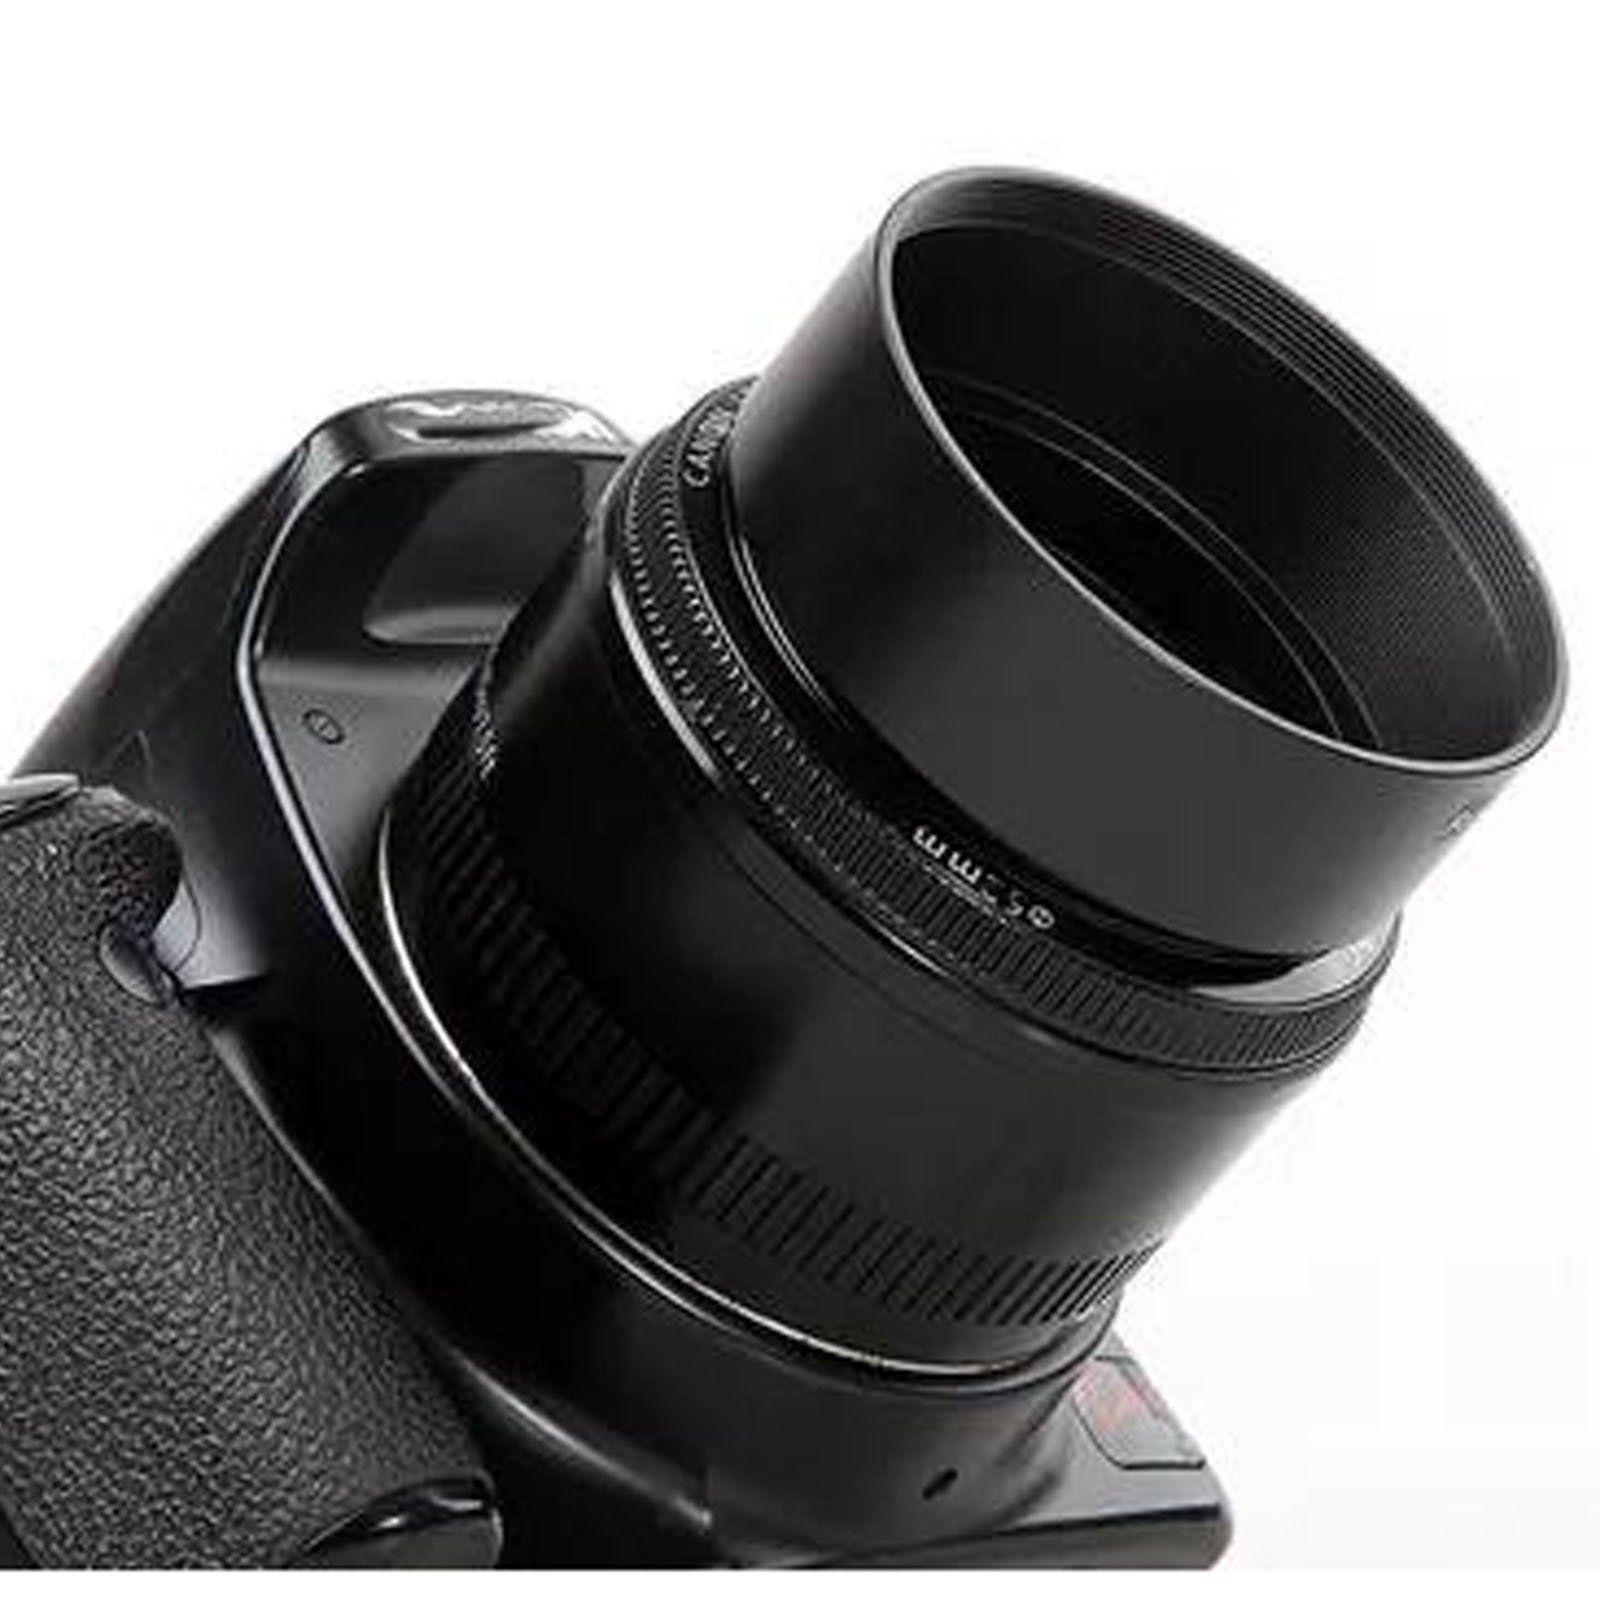 198 52mm Standard Metal Lens Lenses Hood Black For Digital Canon Cameras Screw Mount Nikon Sony Pentax Ebay Electronics